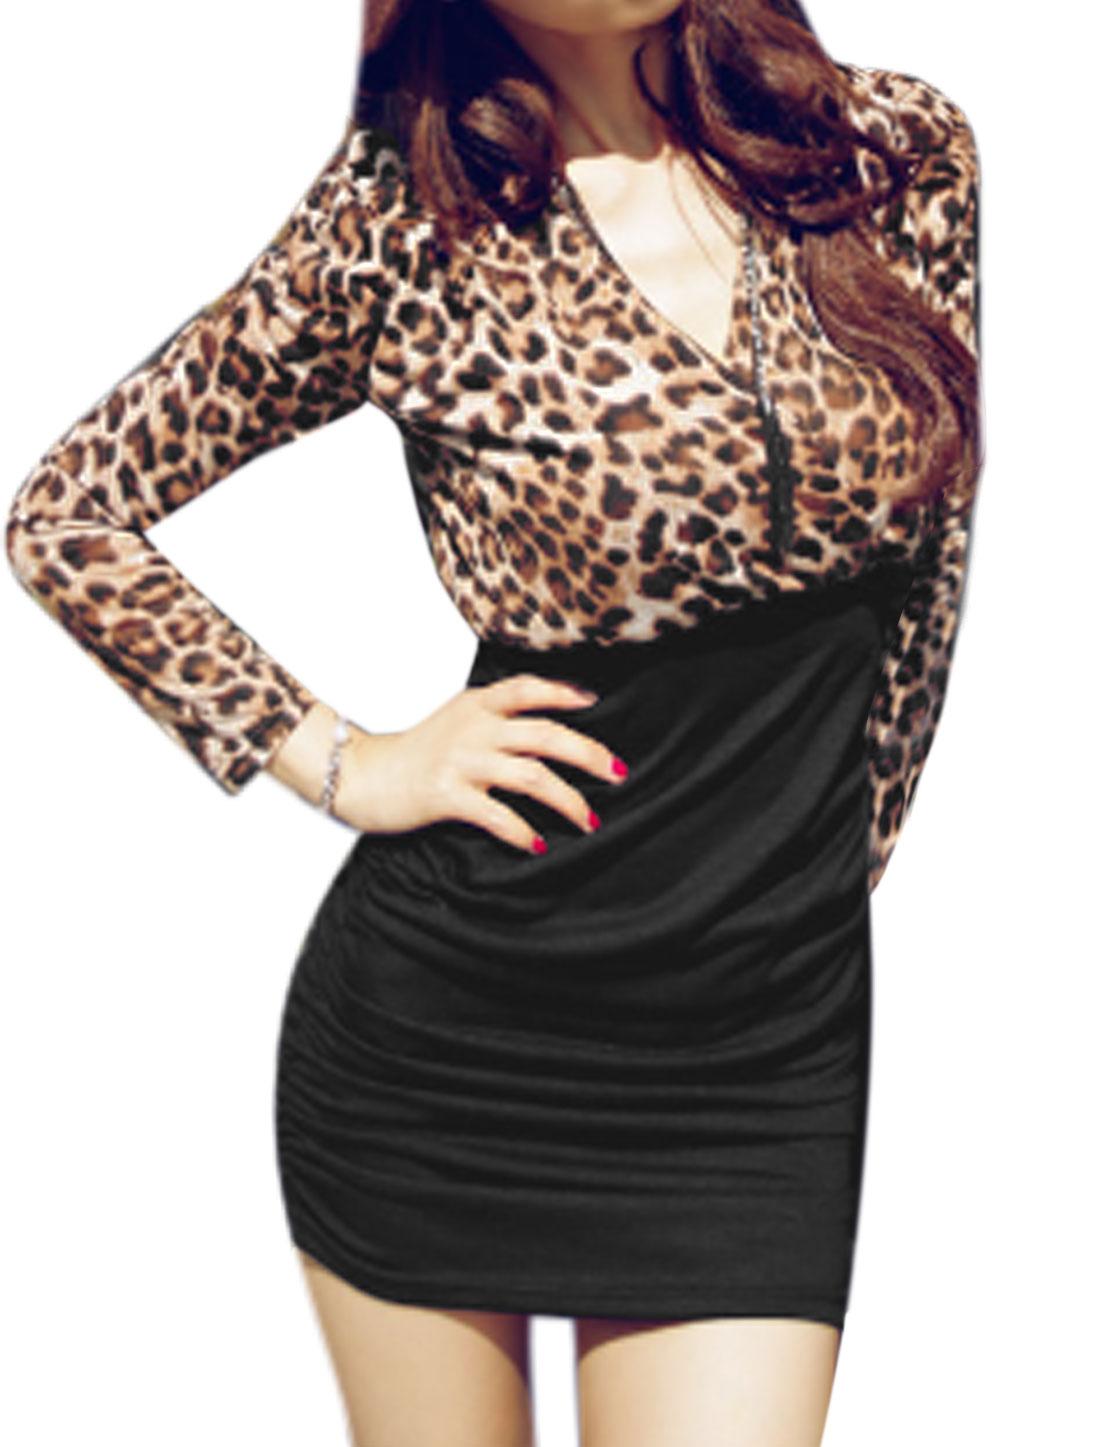 Women Deep V Neck Long Sleeves Leopard Prints Ruched Sheath Dress Black M